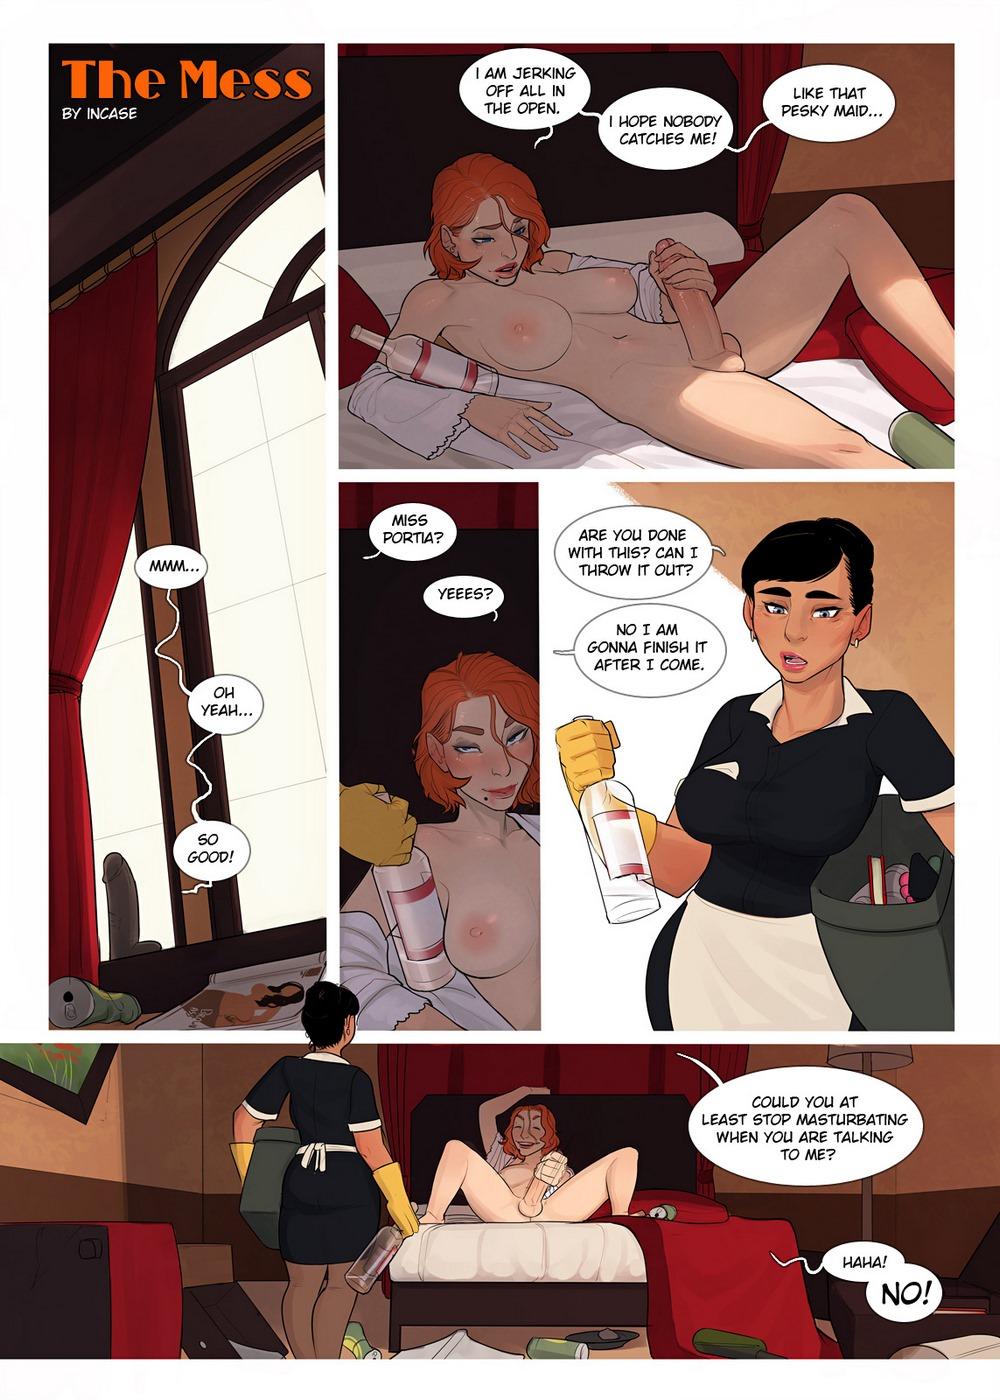 InCase- The Mess 1 & 2 porn comics 8 muses